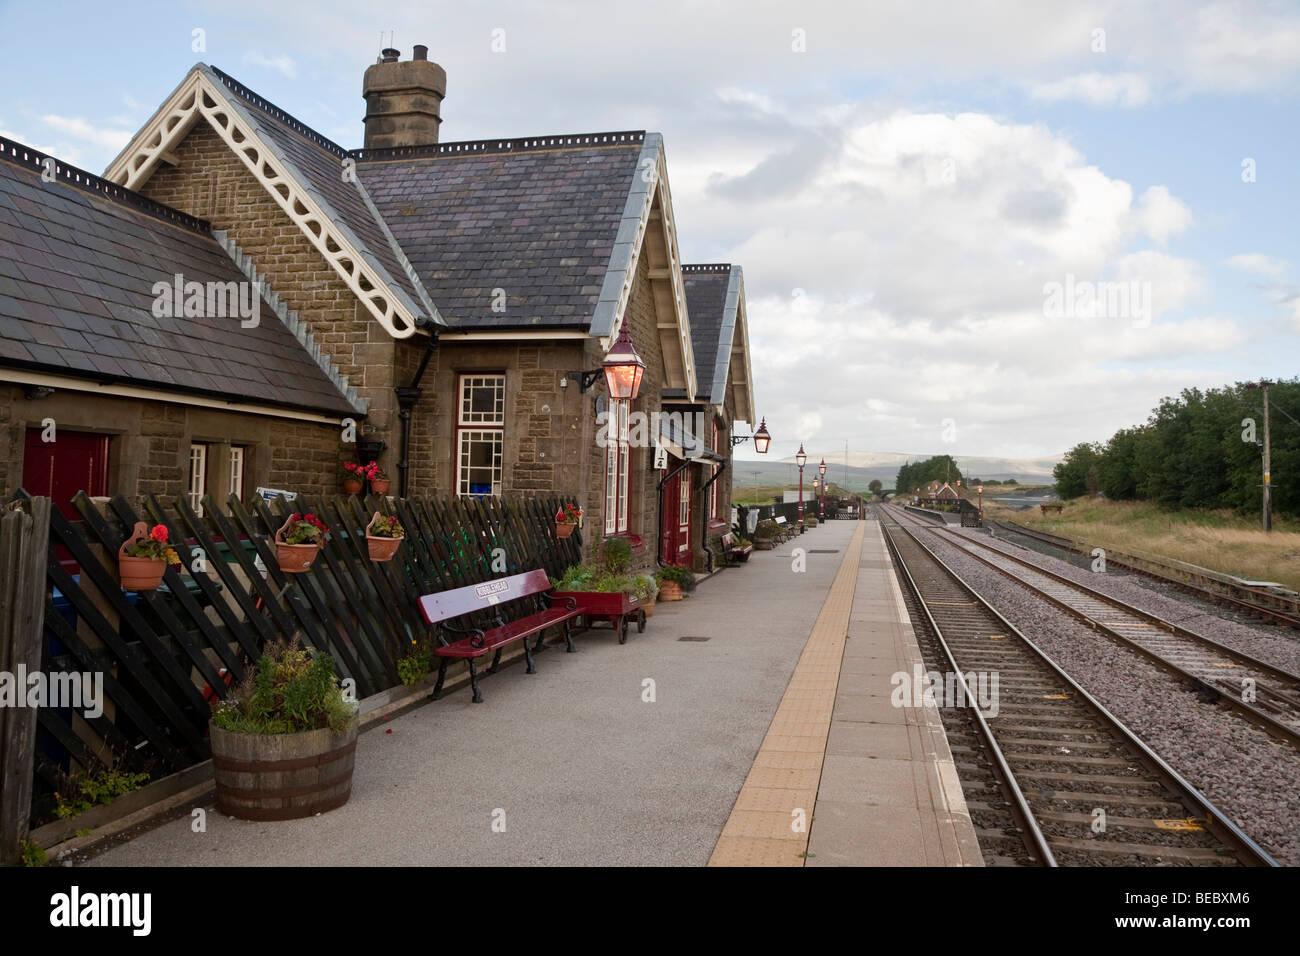 Ribblehead station, North Yorkshire, England, UK Railway Station, on the Settle-Carlisle railway line - Stock Image